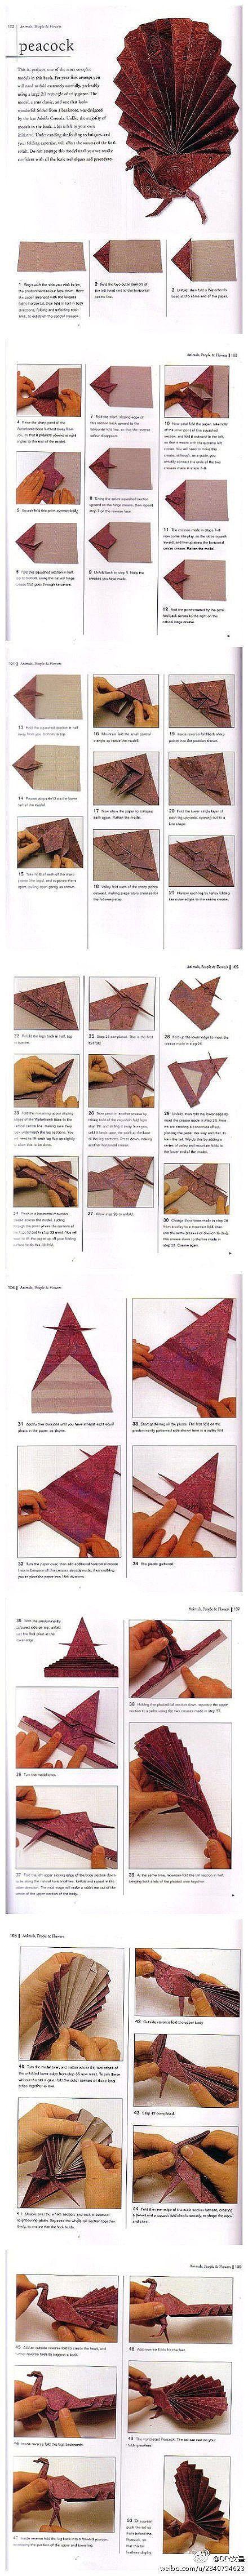 peacock origami